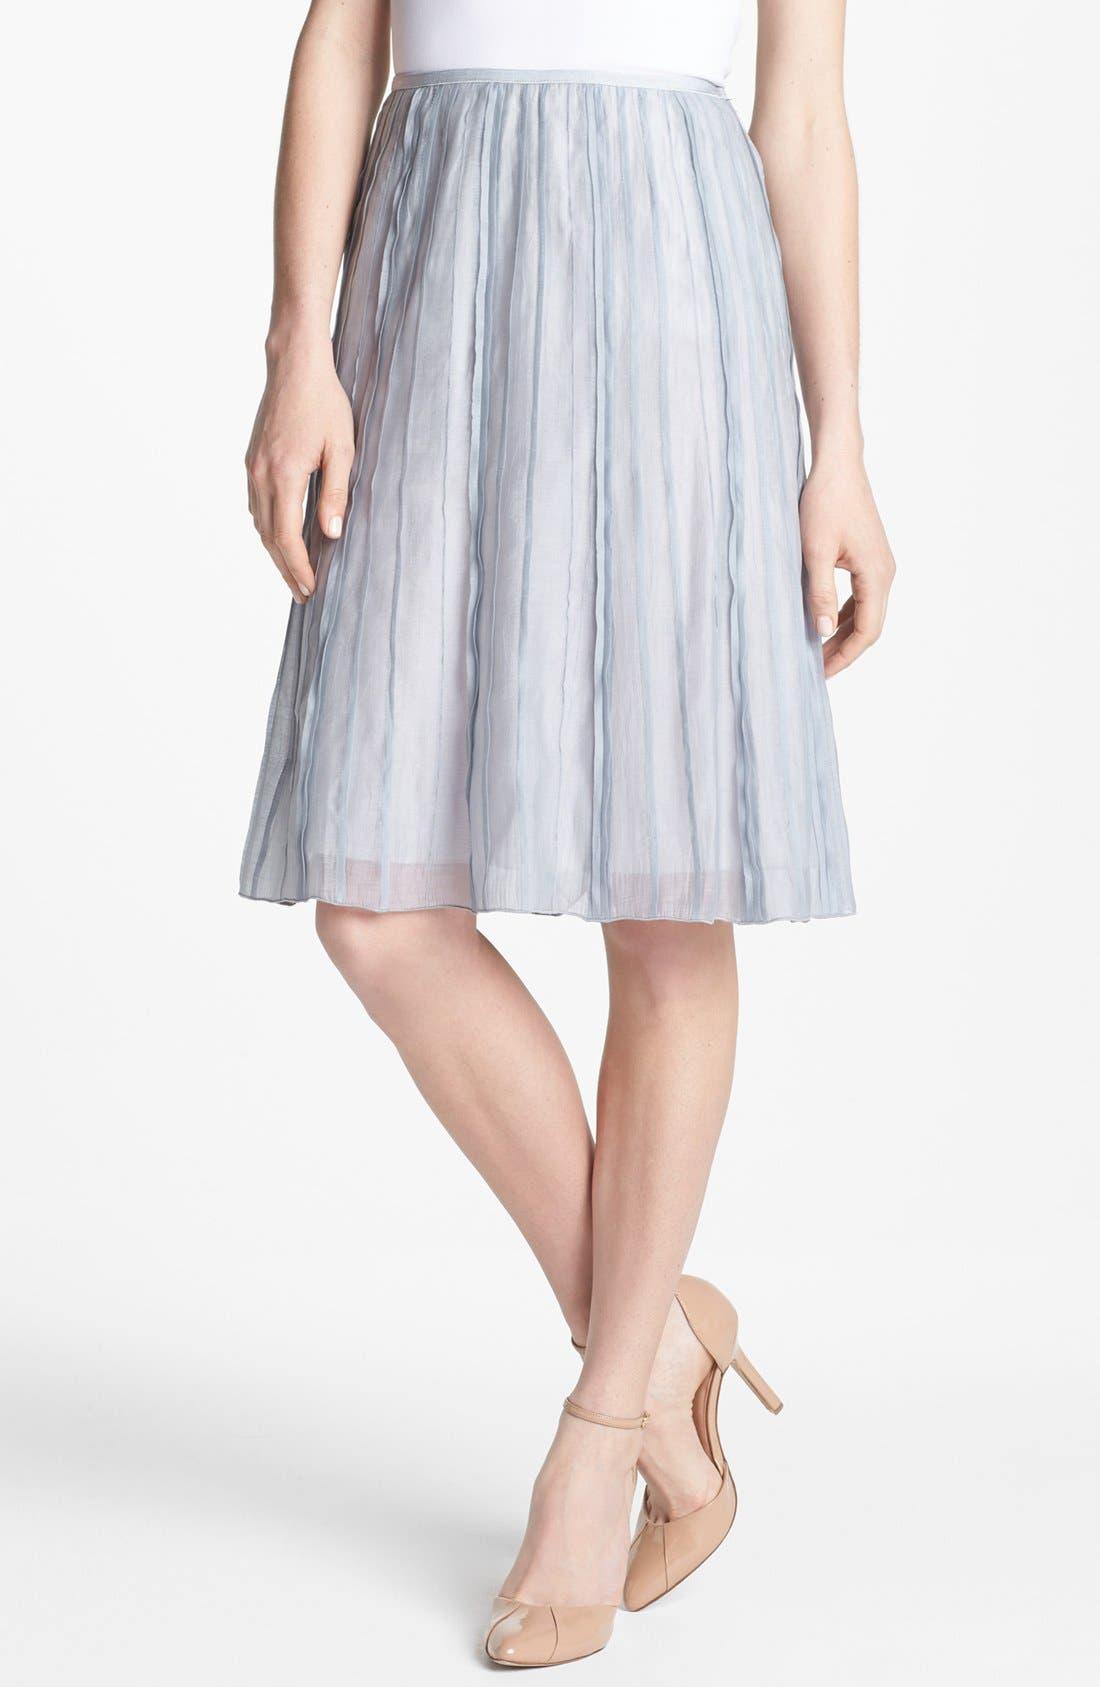 NIC+ZOE, Nic + Zoe 'Batiste' Flared Skirt, Main thumbnail 1, color, 041